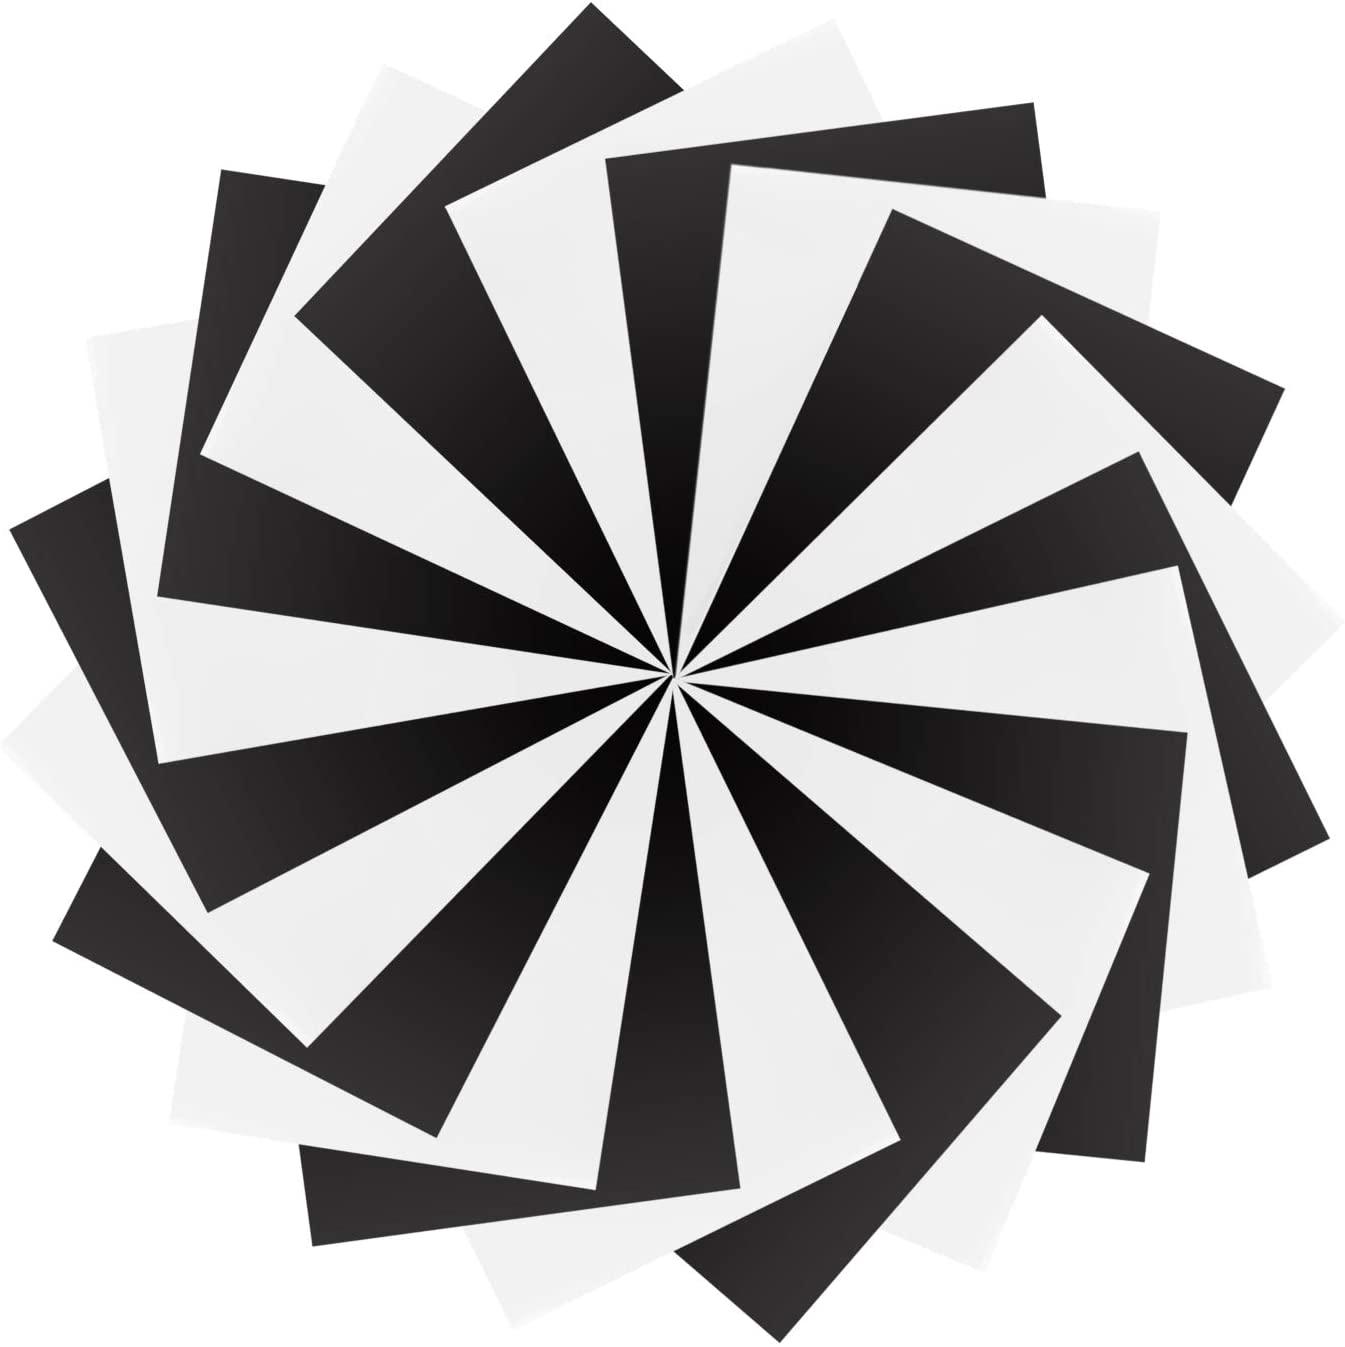 SOMOLUX Iron on Vinyl HTV Heat Transfer Vinyl 12 x 10 20 Sheets Matte Finished HTV Bundle Heat Press Vinyl Easy Cut & Weed & Press for T-Shirts Matte Black/White